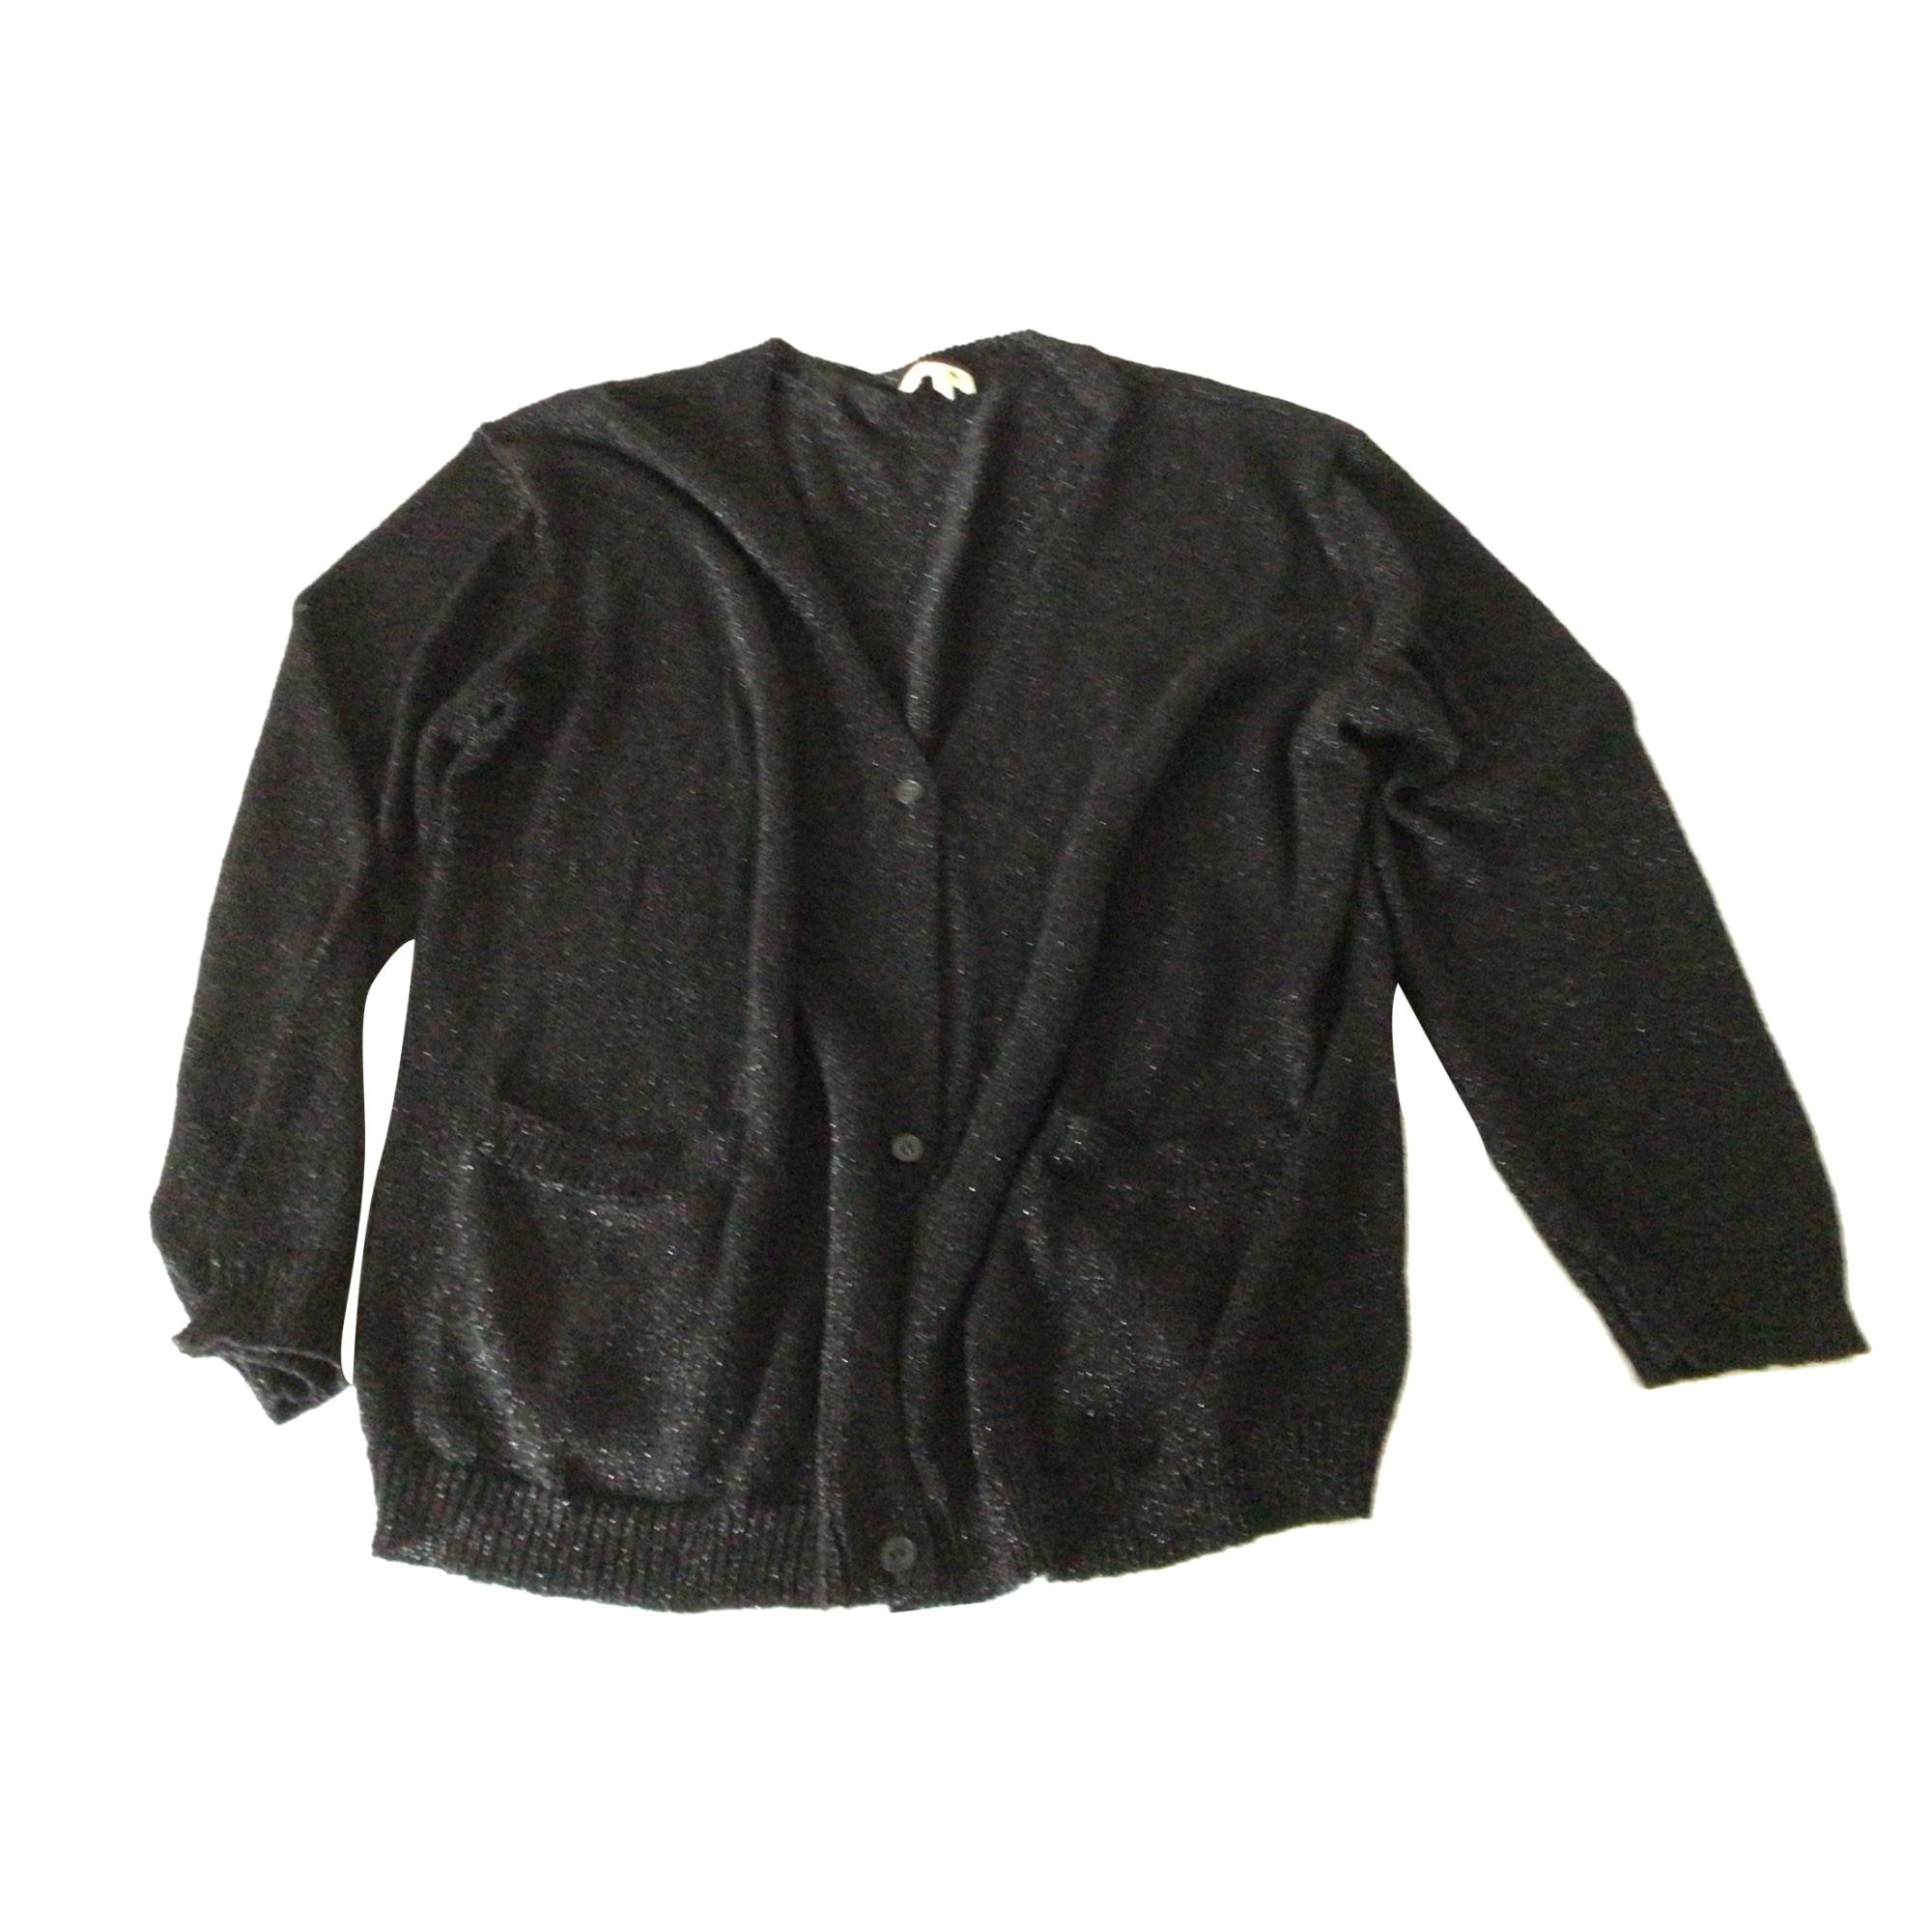 Gilet, cardigan SOEUR Noir